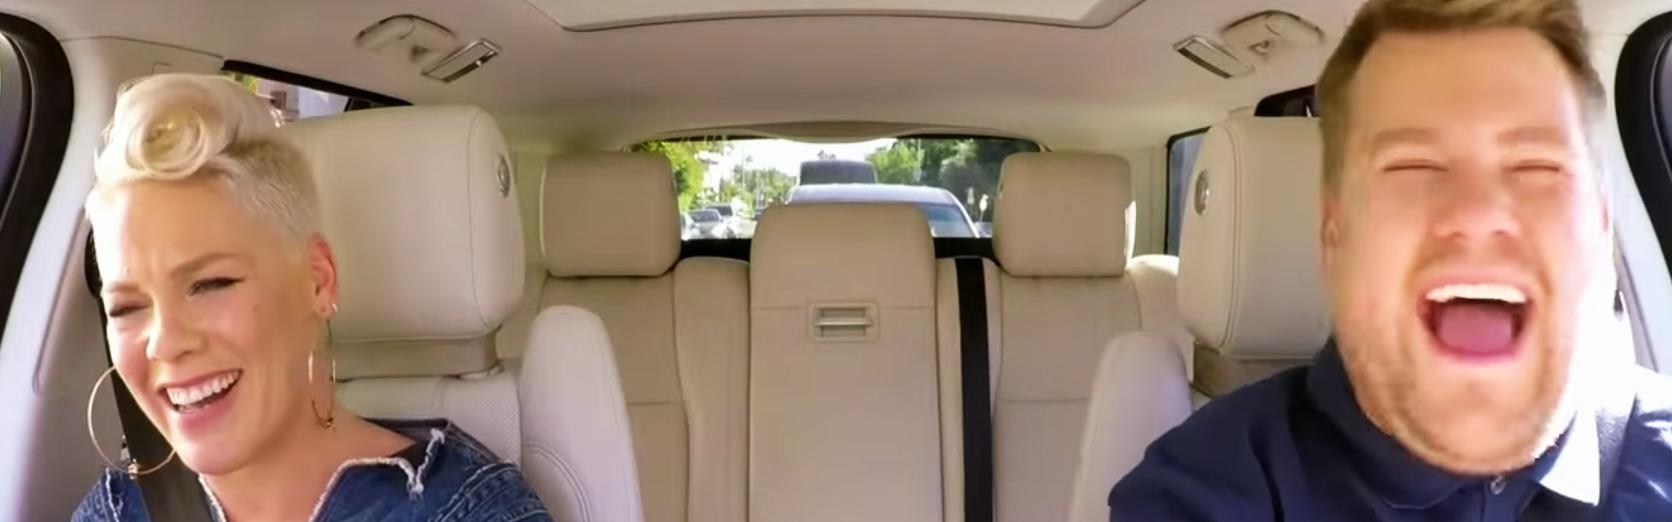 Carpoolpink header